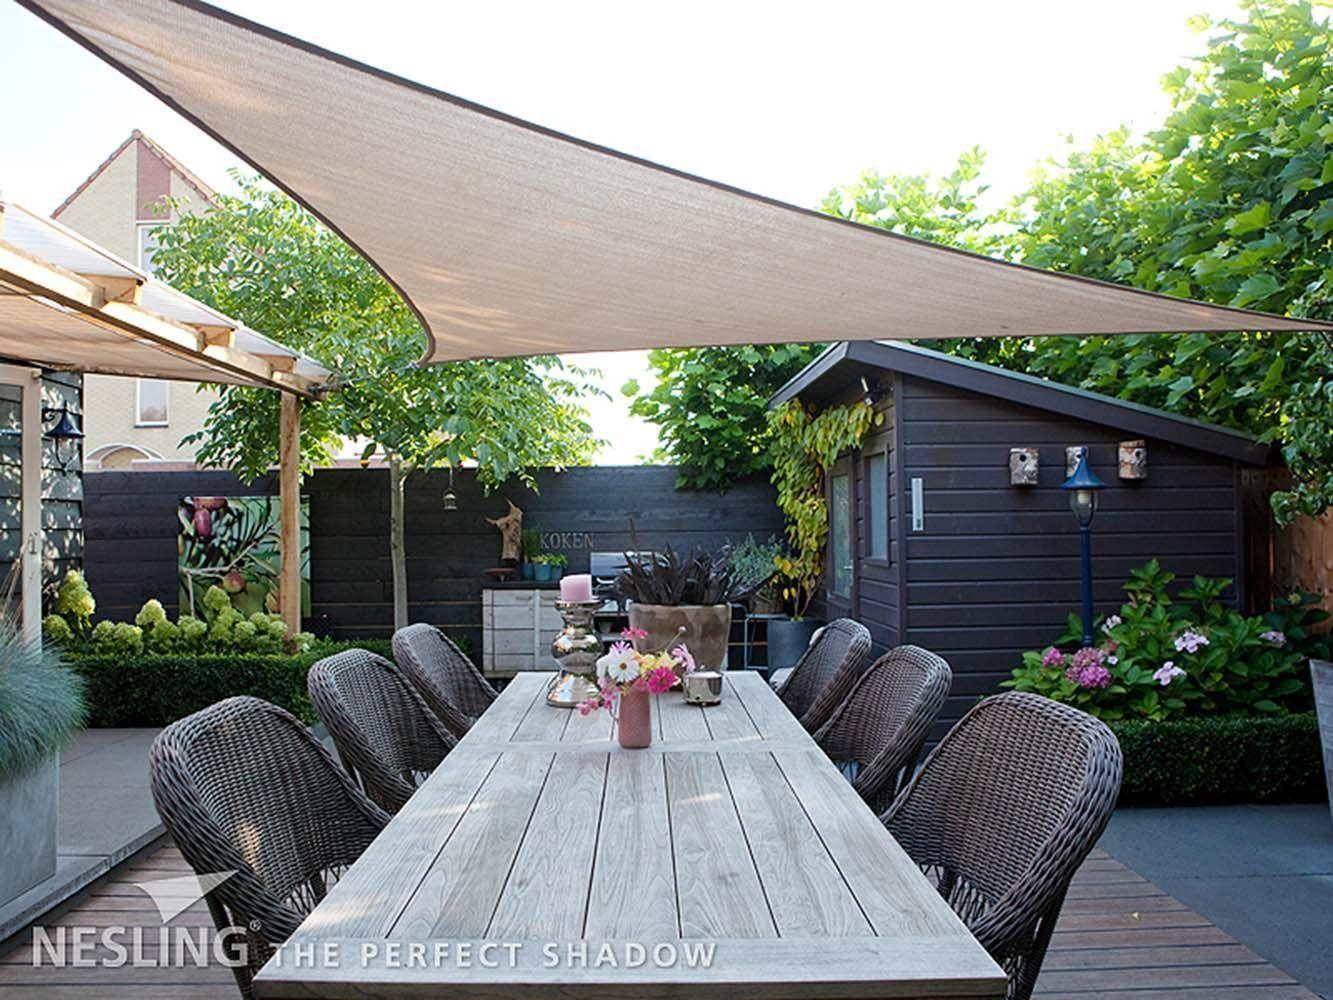 voile d 39 ombrage triangulaire coolfit sable 3 6 x 3 6 x 3 6 m. Black Bedroom Furniture Sets. Home Design Ideas